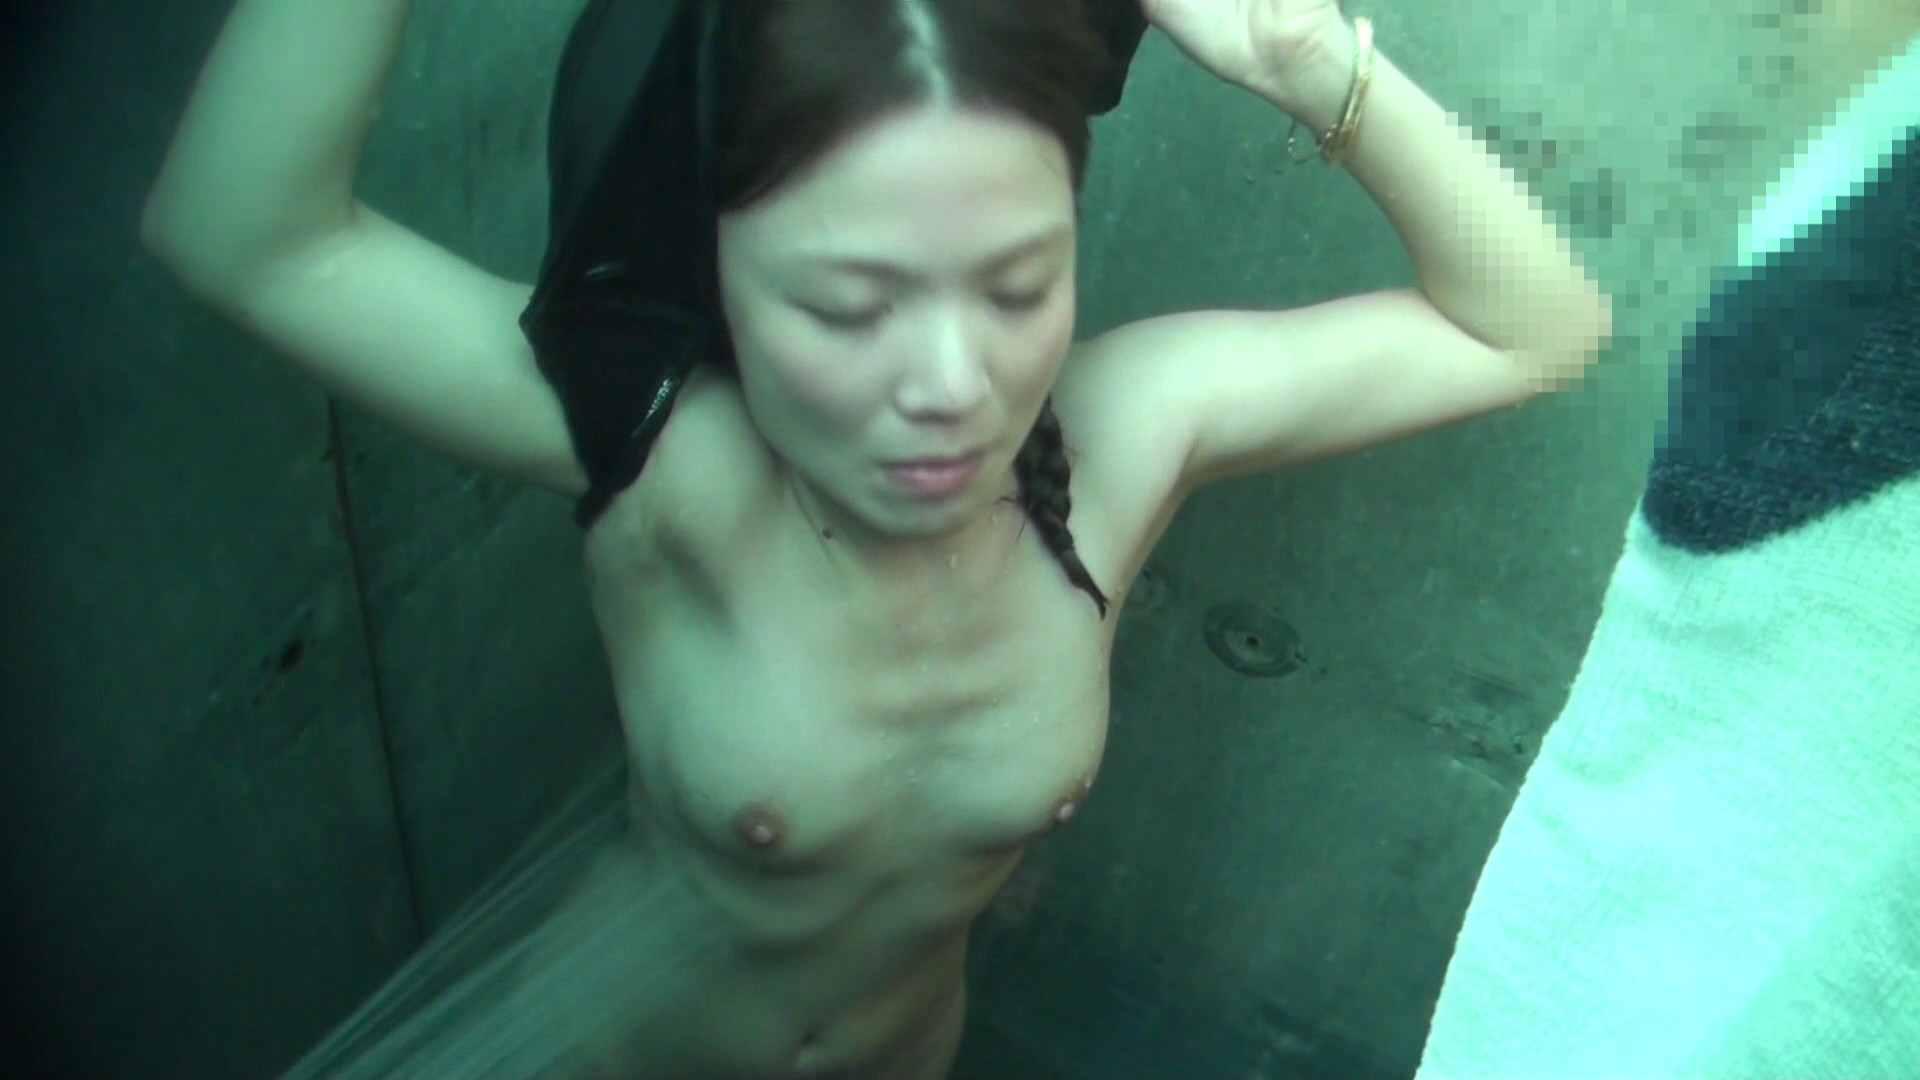 Vol.12 女性の性器には予想外の砂が混入しているようです。 シャワー中 | 高画質  96連発 31